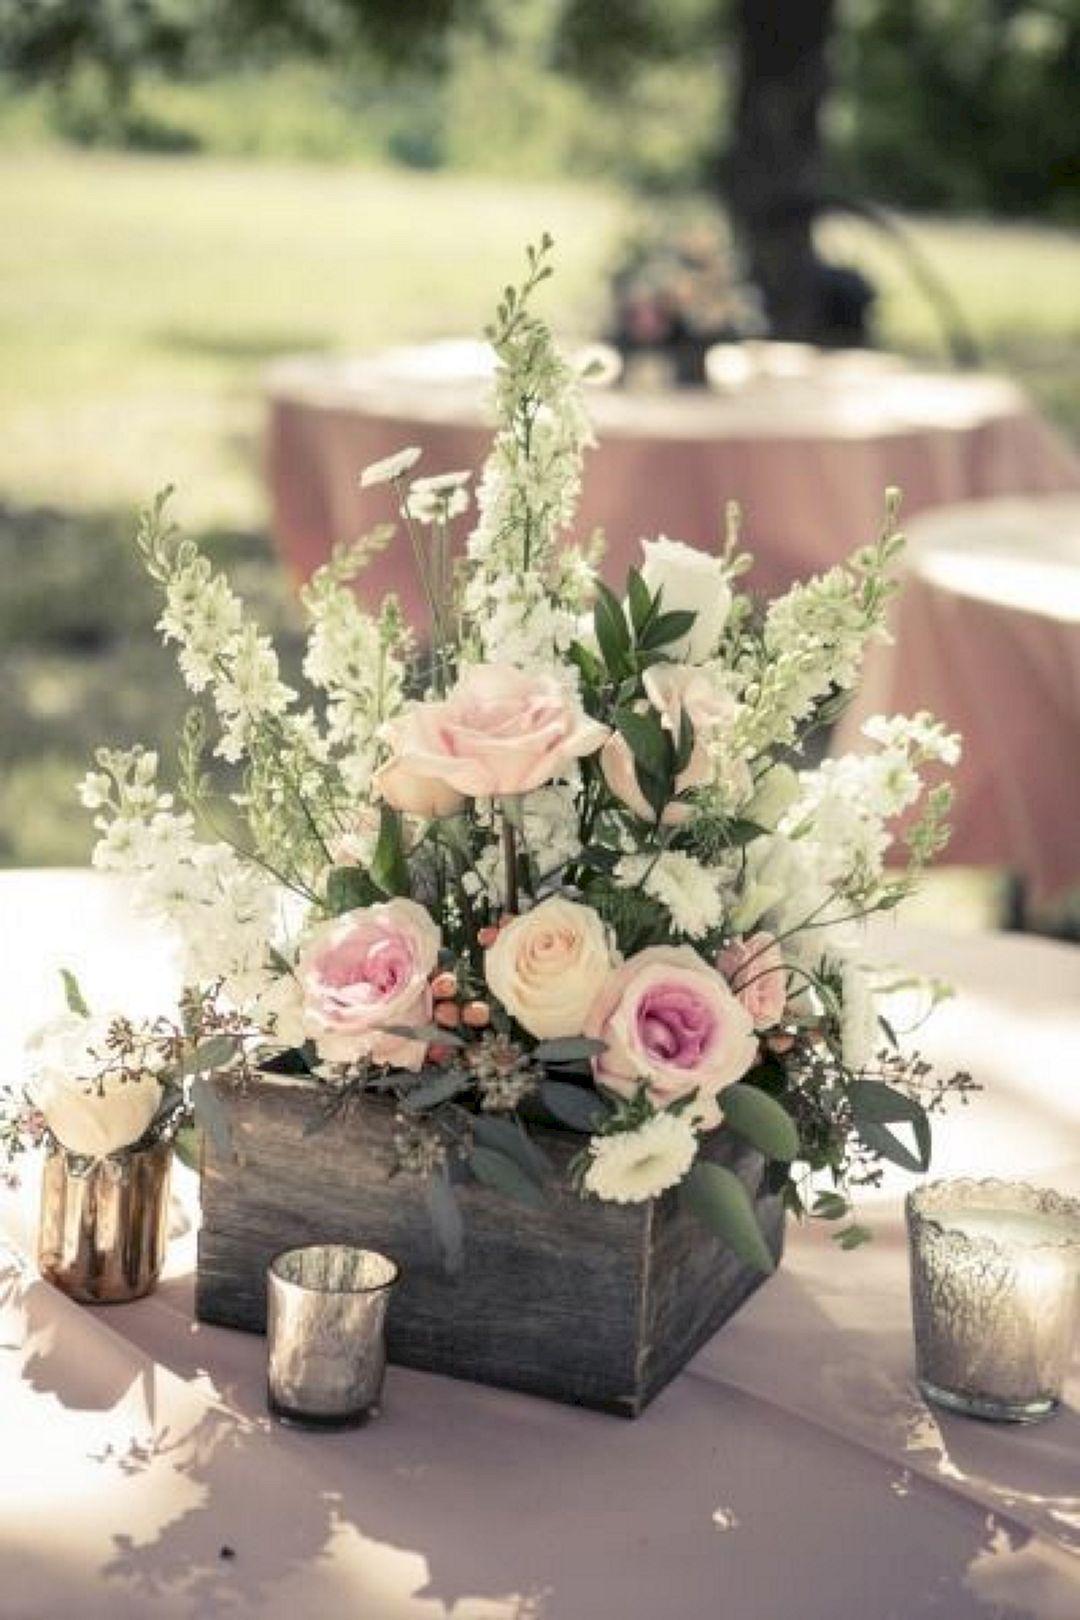 Wedding decoration ideas rustic   DIY Creative Rustic Chic Wedding Centerpieces Ideas  Madison